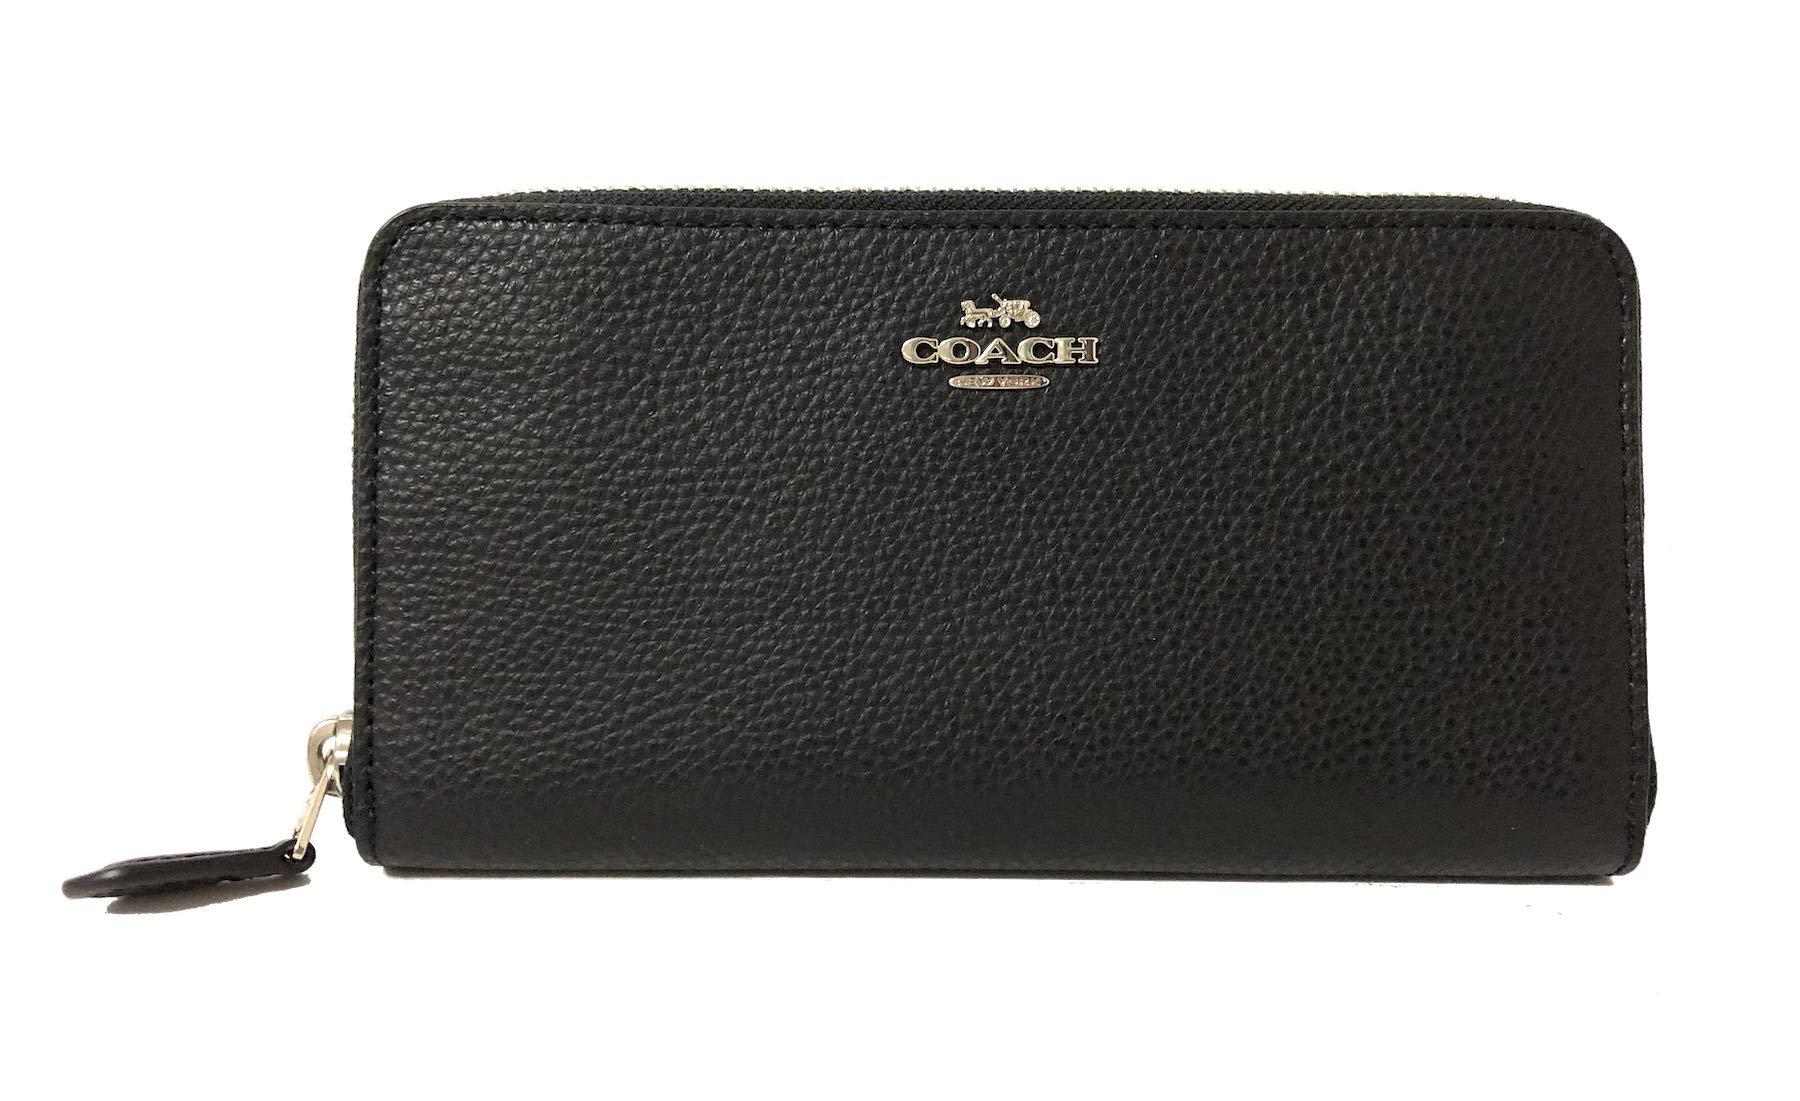 Coach Pebble Leather Accordion Zip Around Wallet (SV/Black), Large